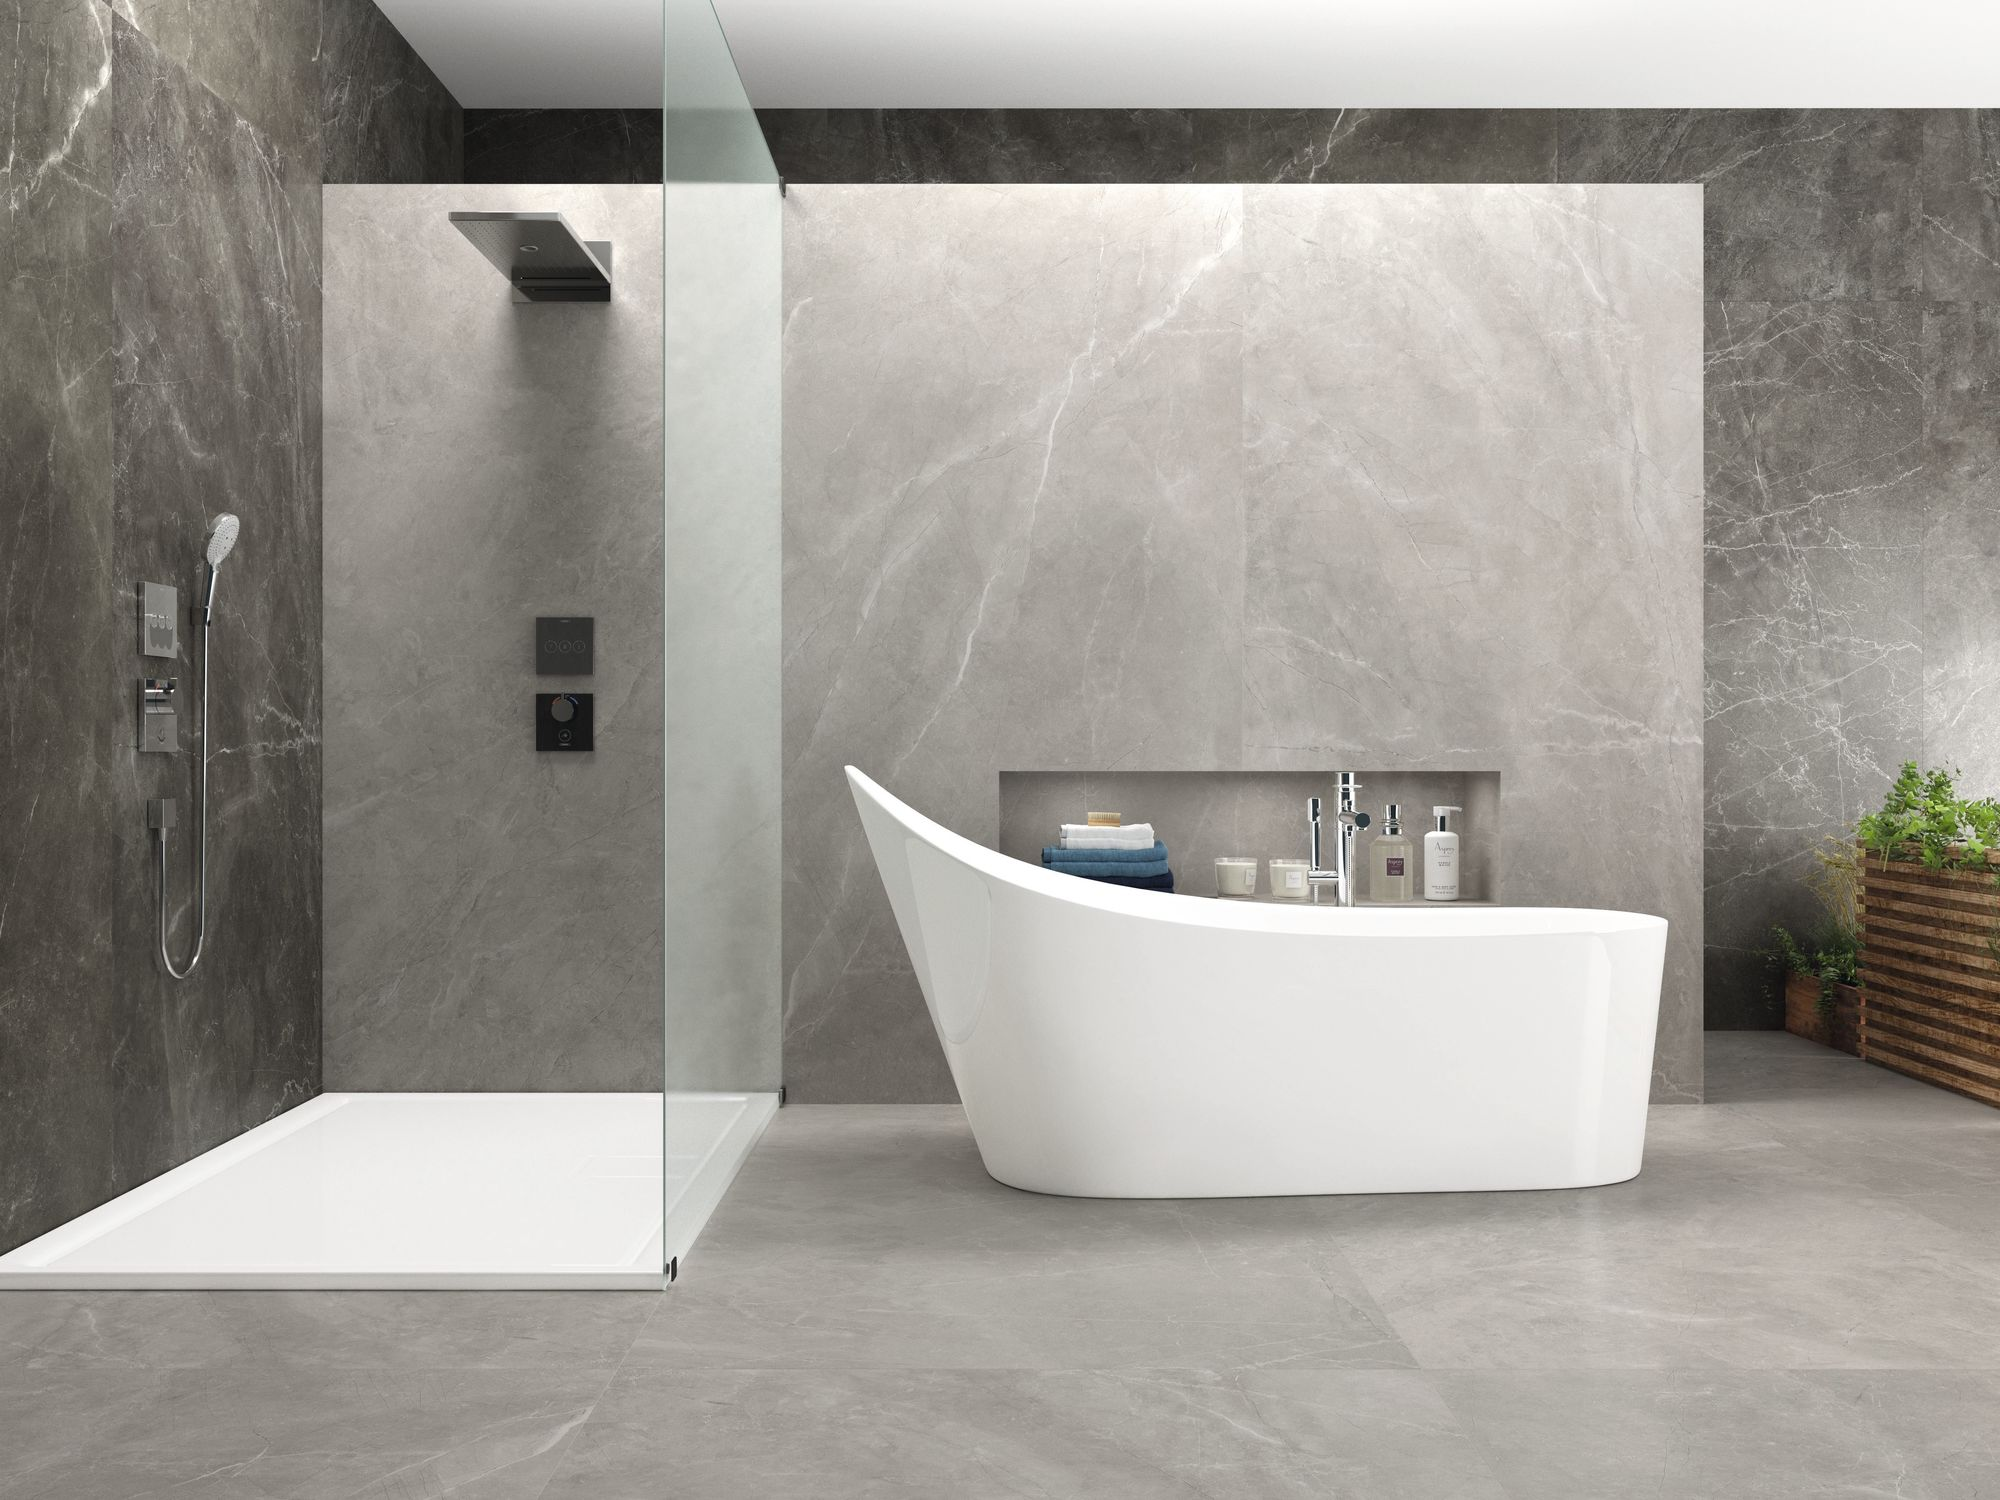 Baldocer bayona-silver-natural-120x240   product - baldocer cerámica